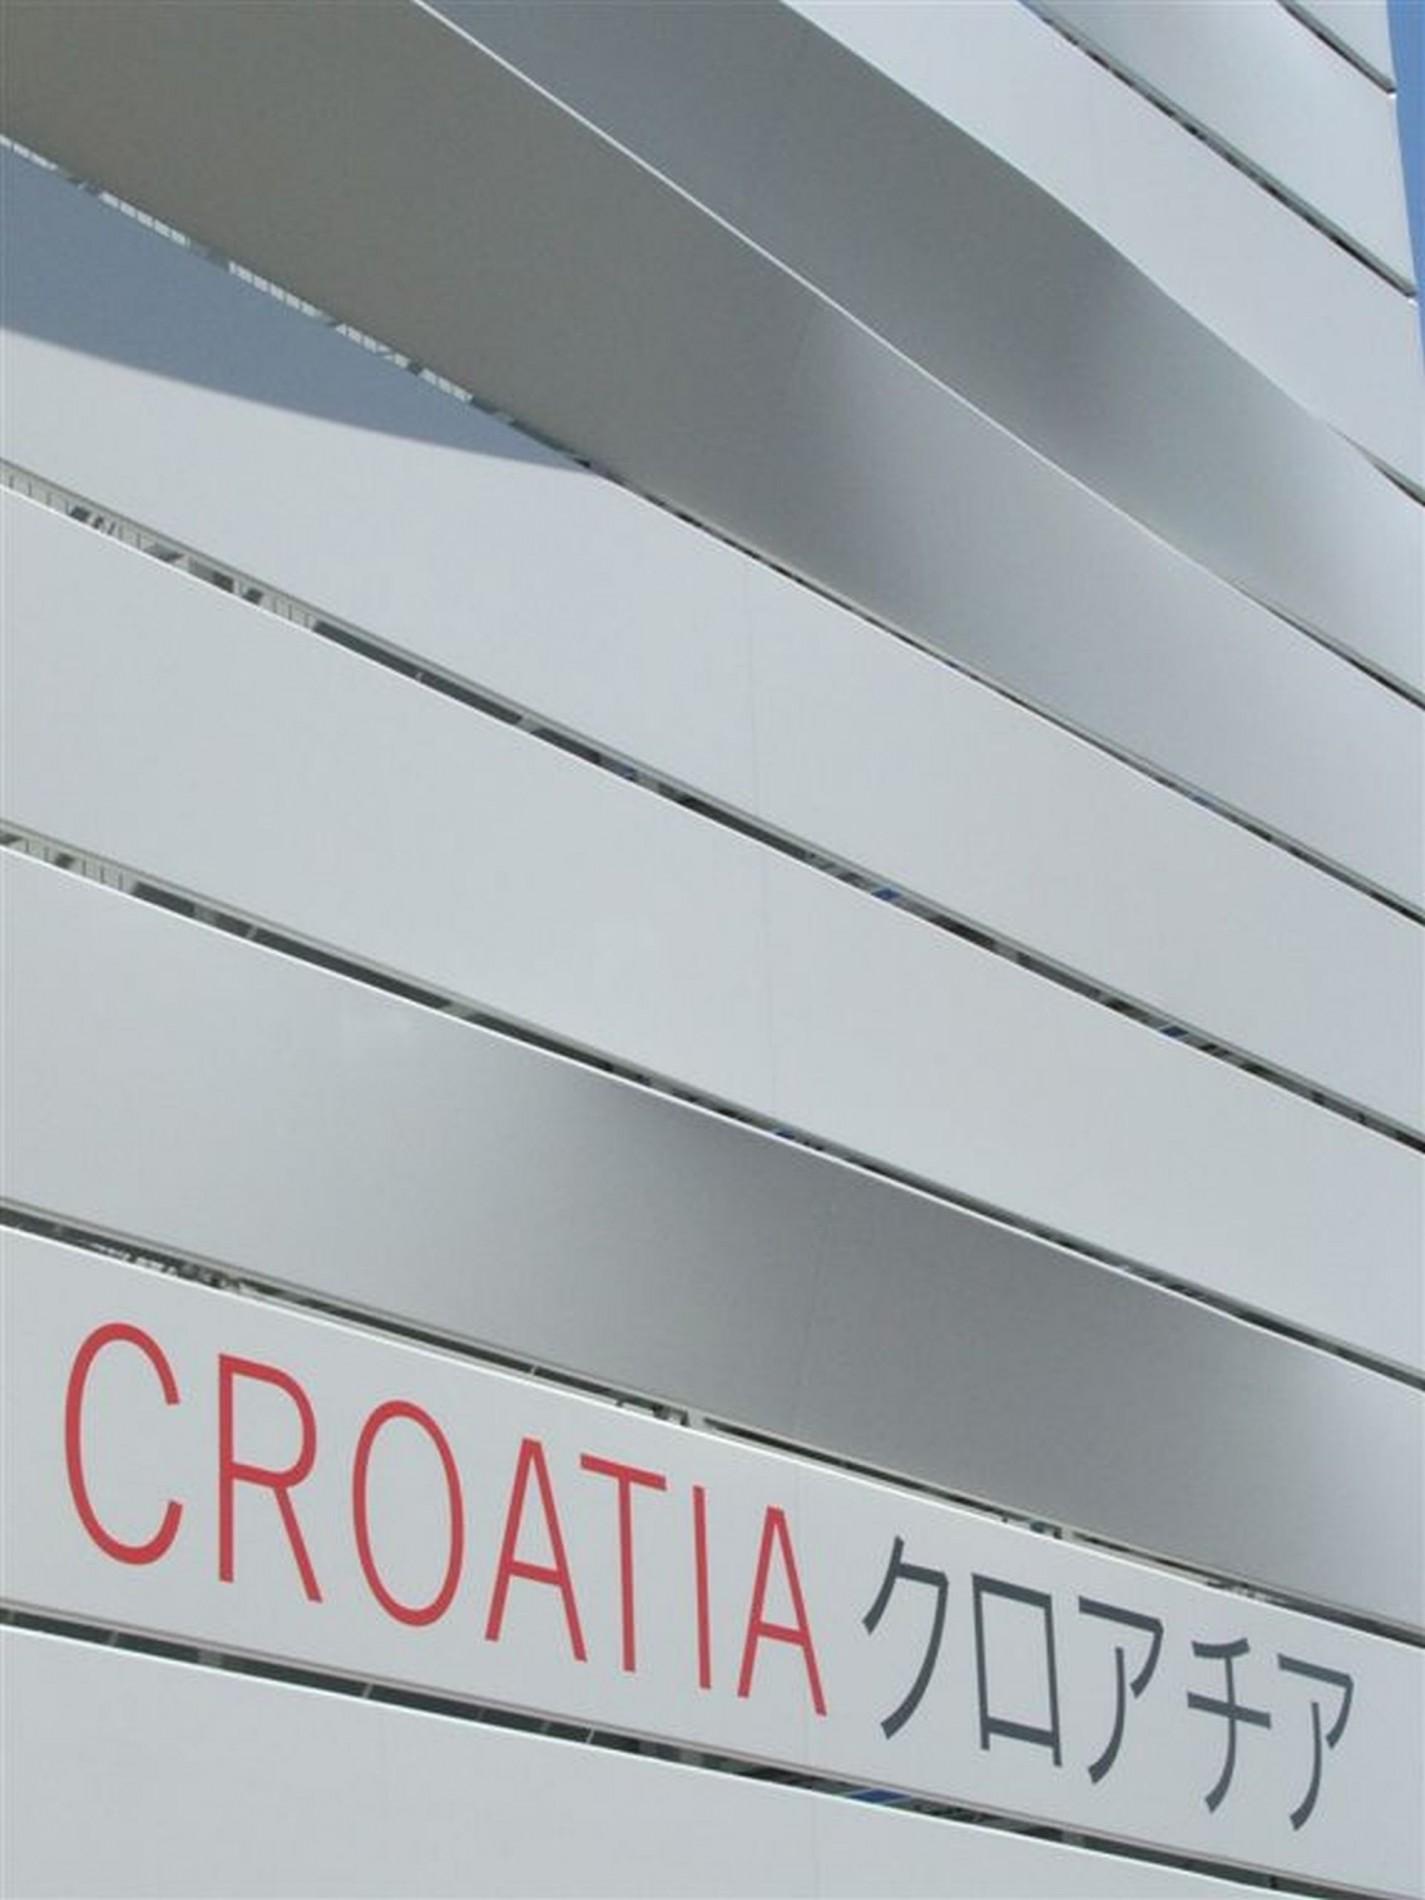 EXPO 2005, expo, croatian pavilion, structure, konstrukcija, japan, steel, čelik, upi-2m, 3lhd